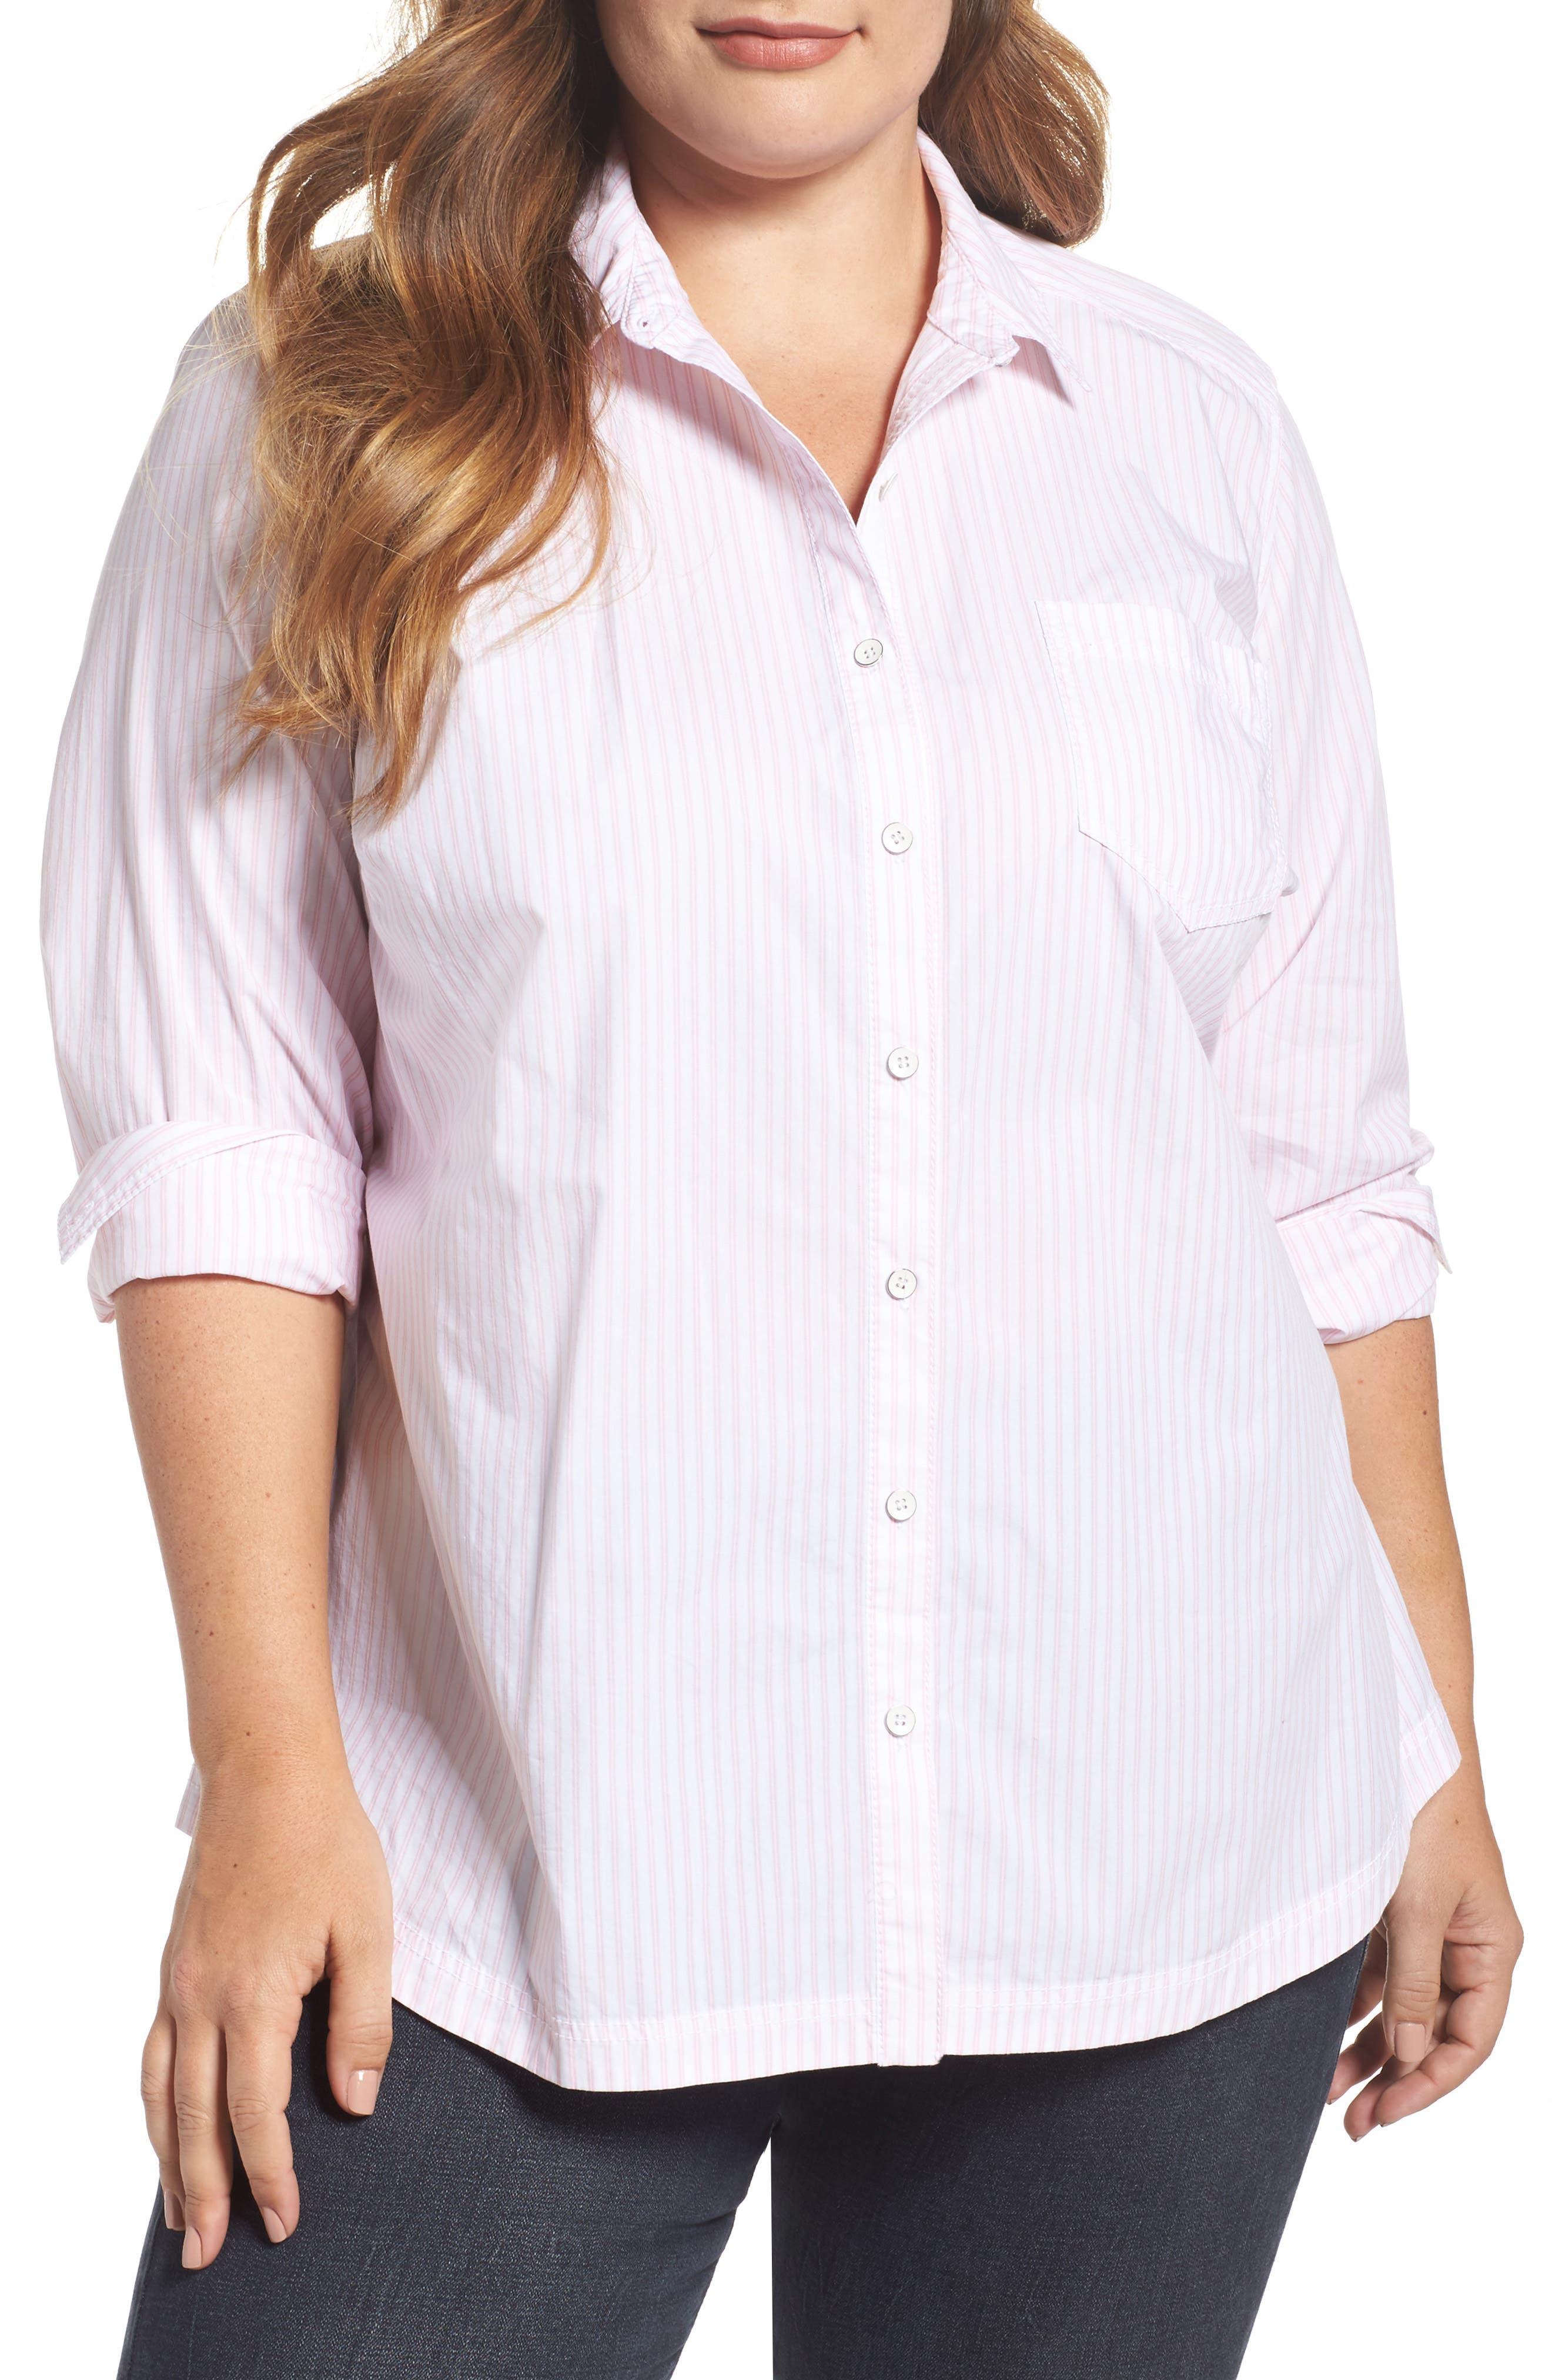 Alternate Image 1 Selected - Caslon® Stripe Button Front Shirt (Plus Size)